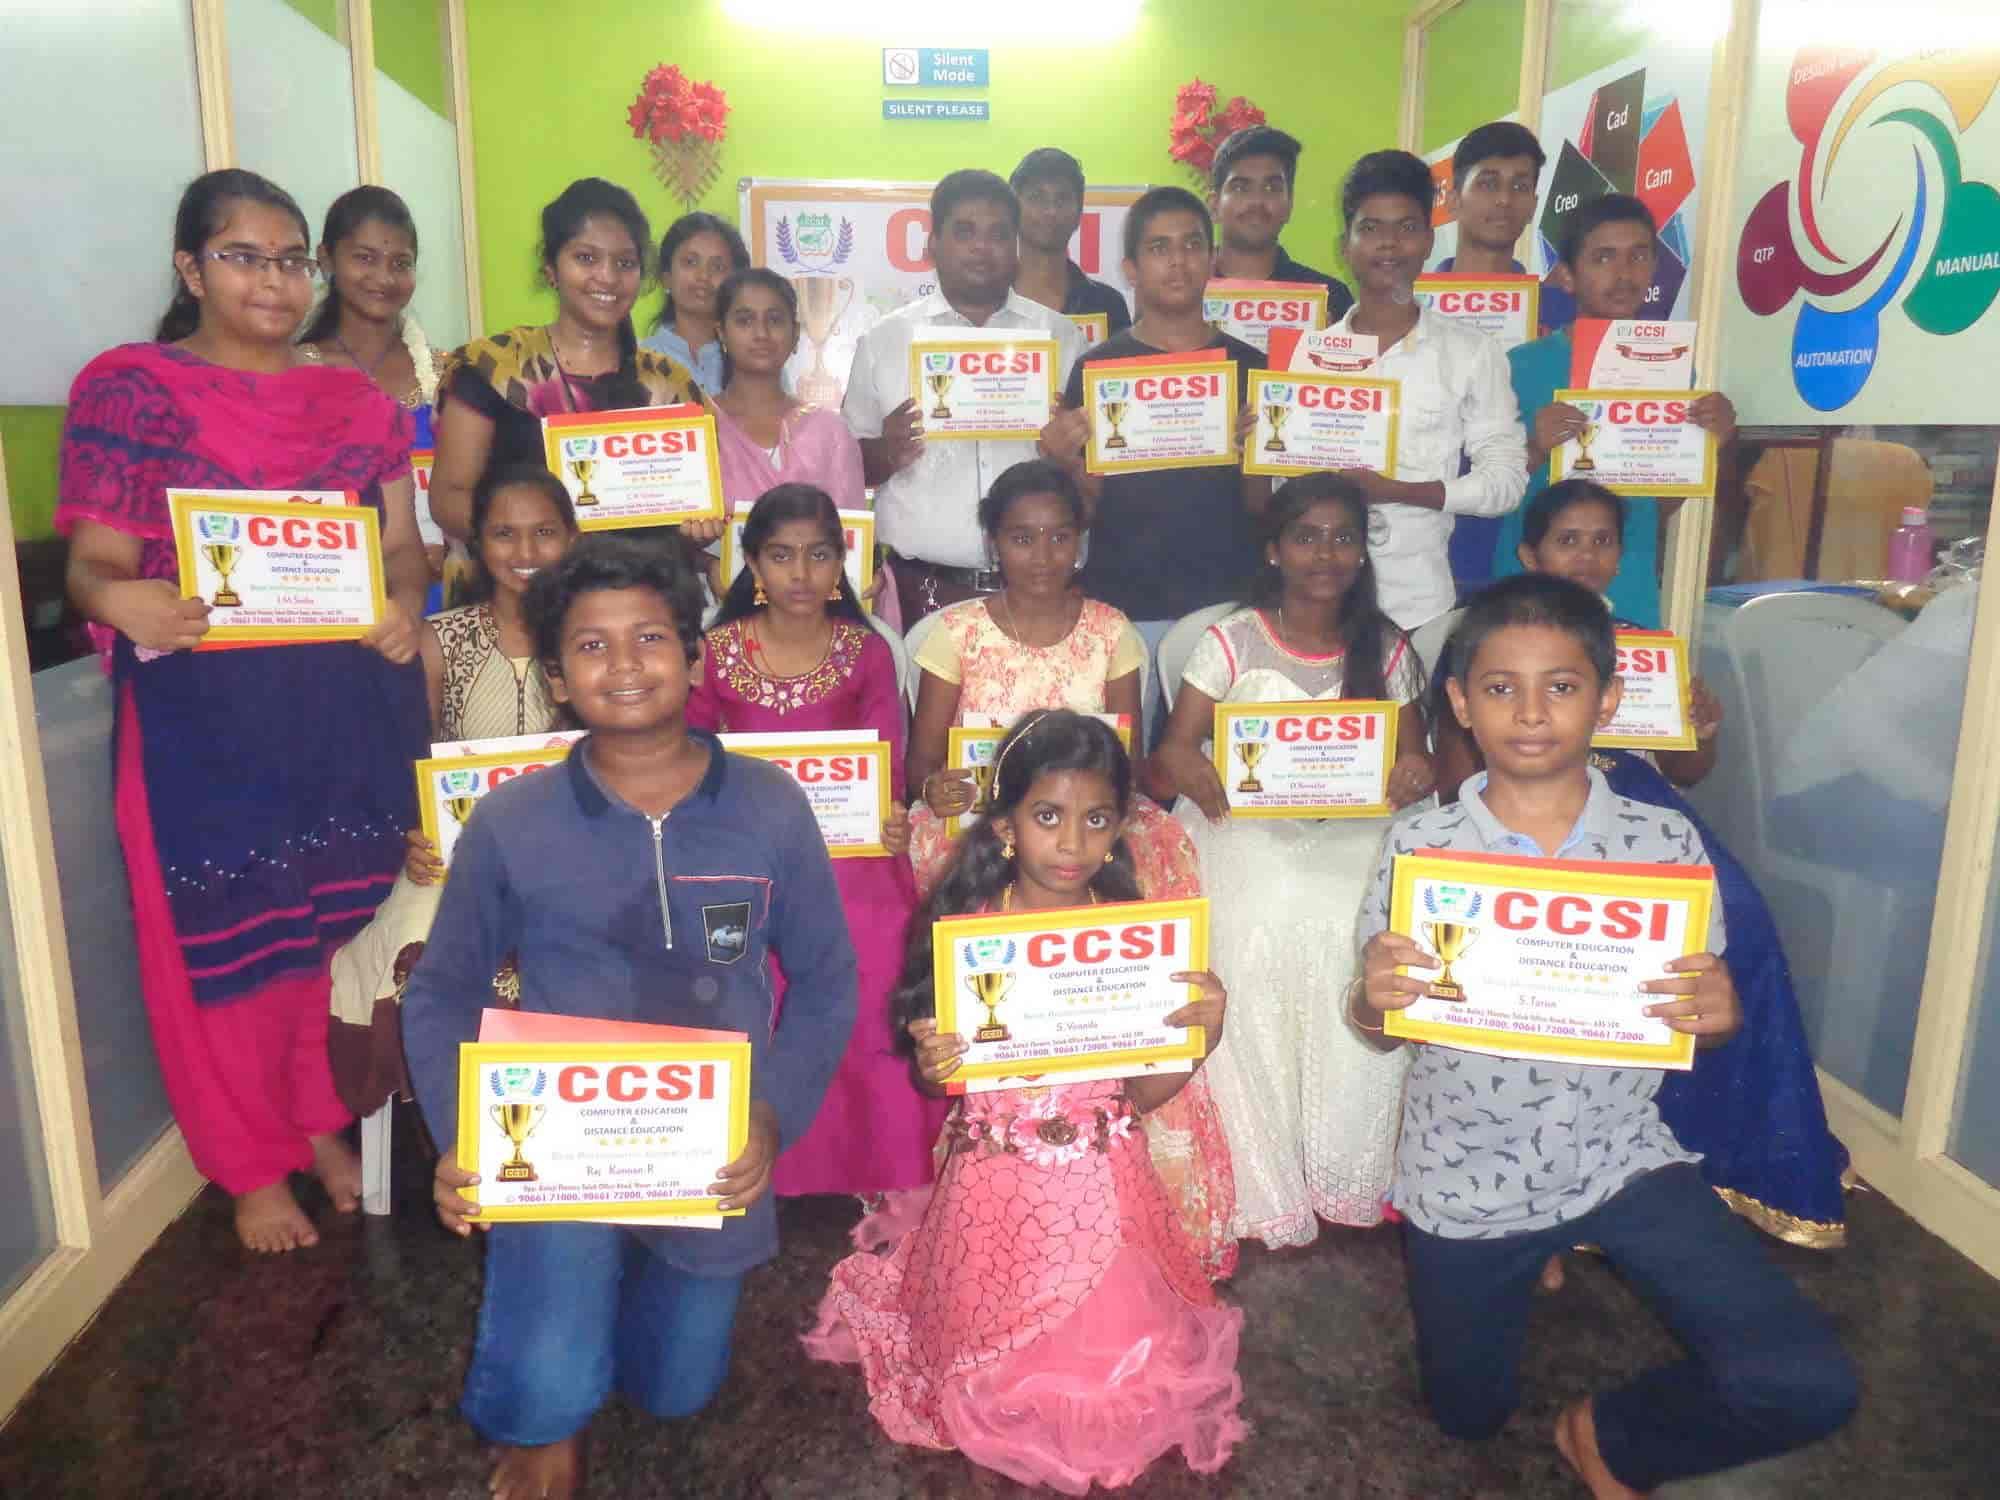 Ccsi Computer Education, Near Balaji Theater - Computer Training